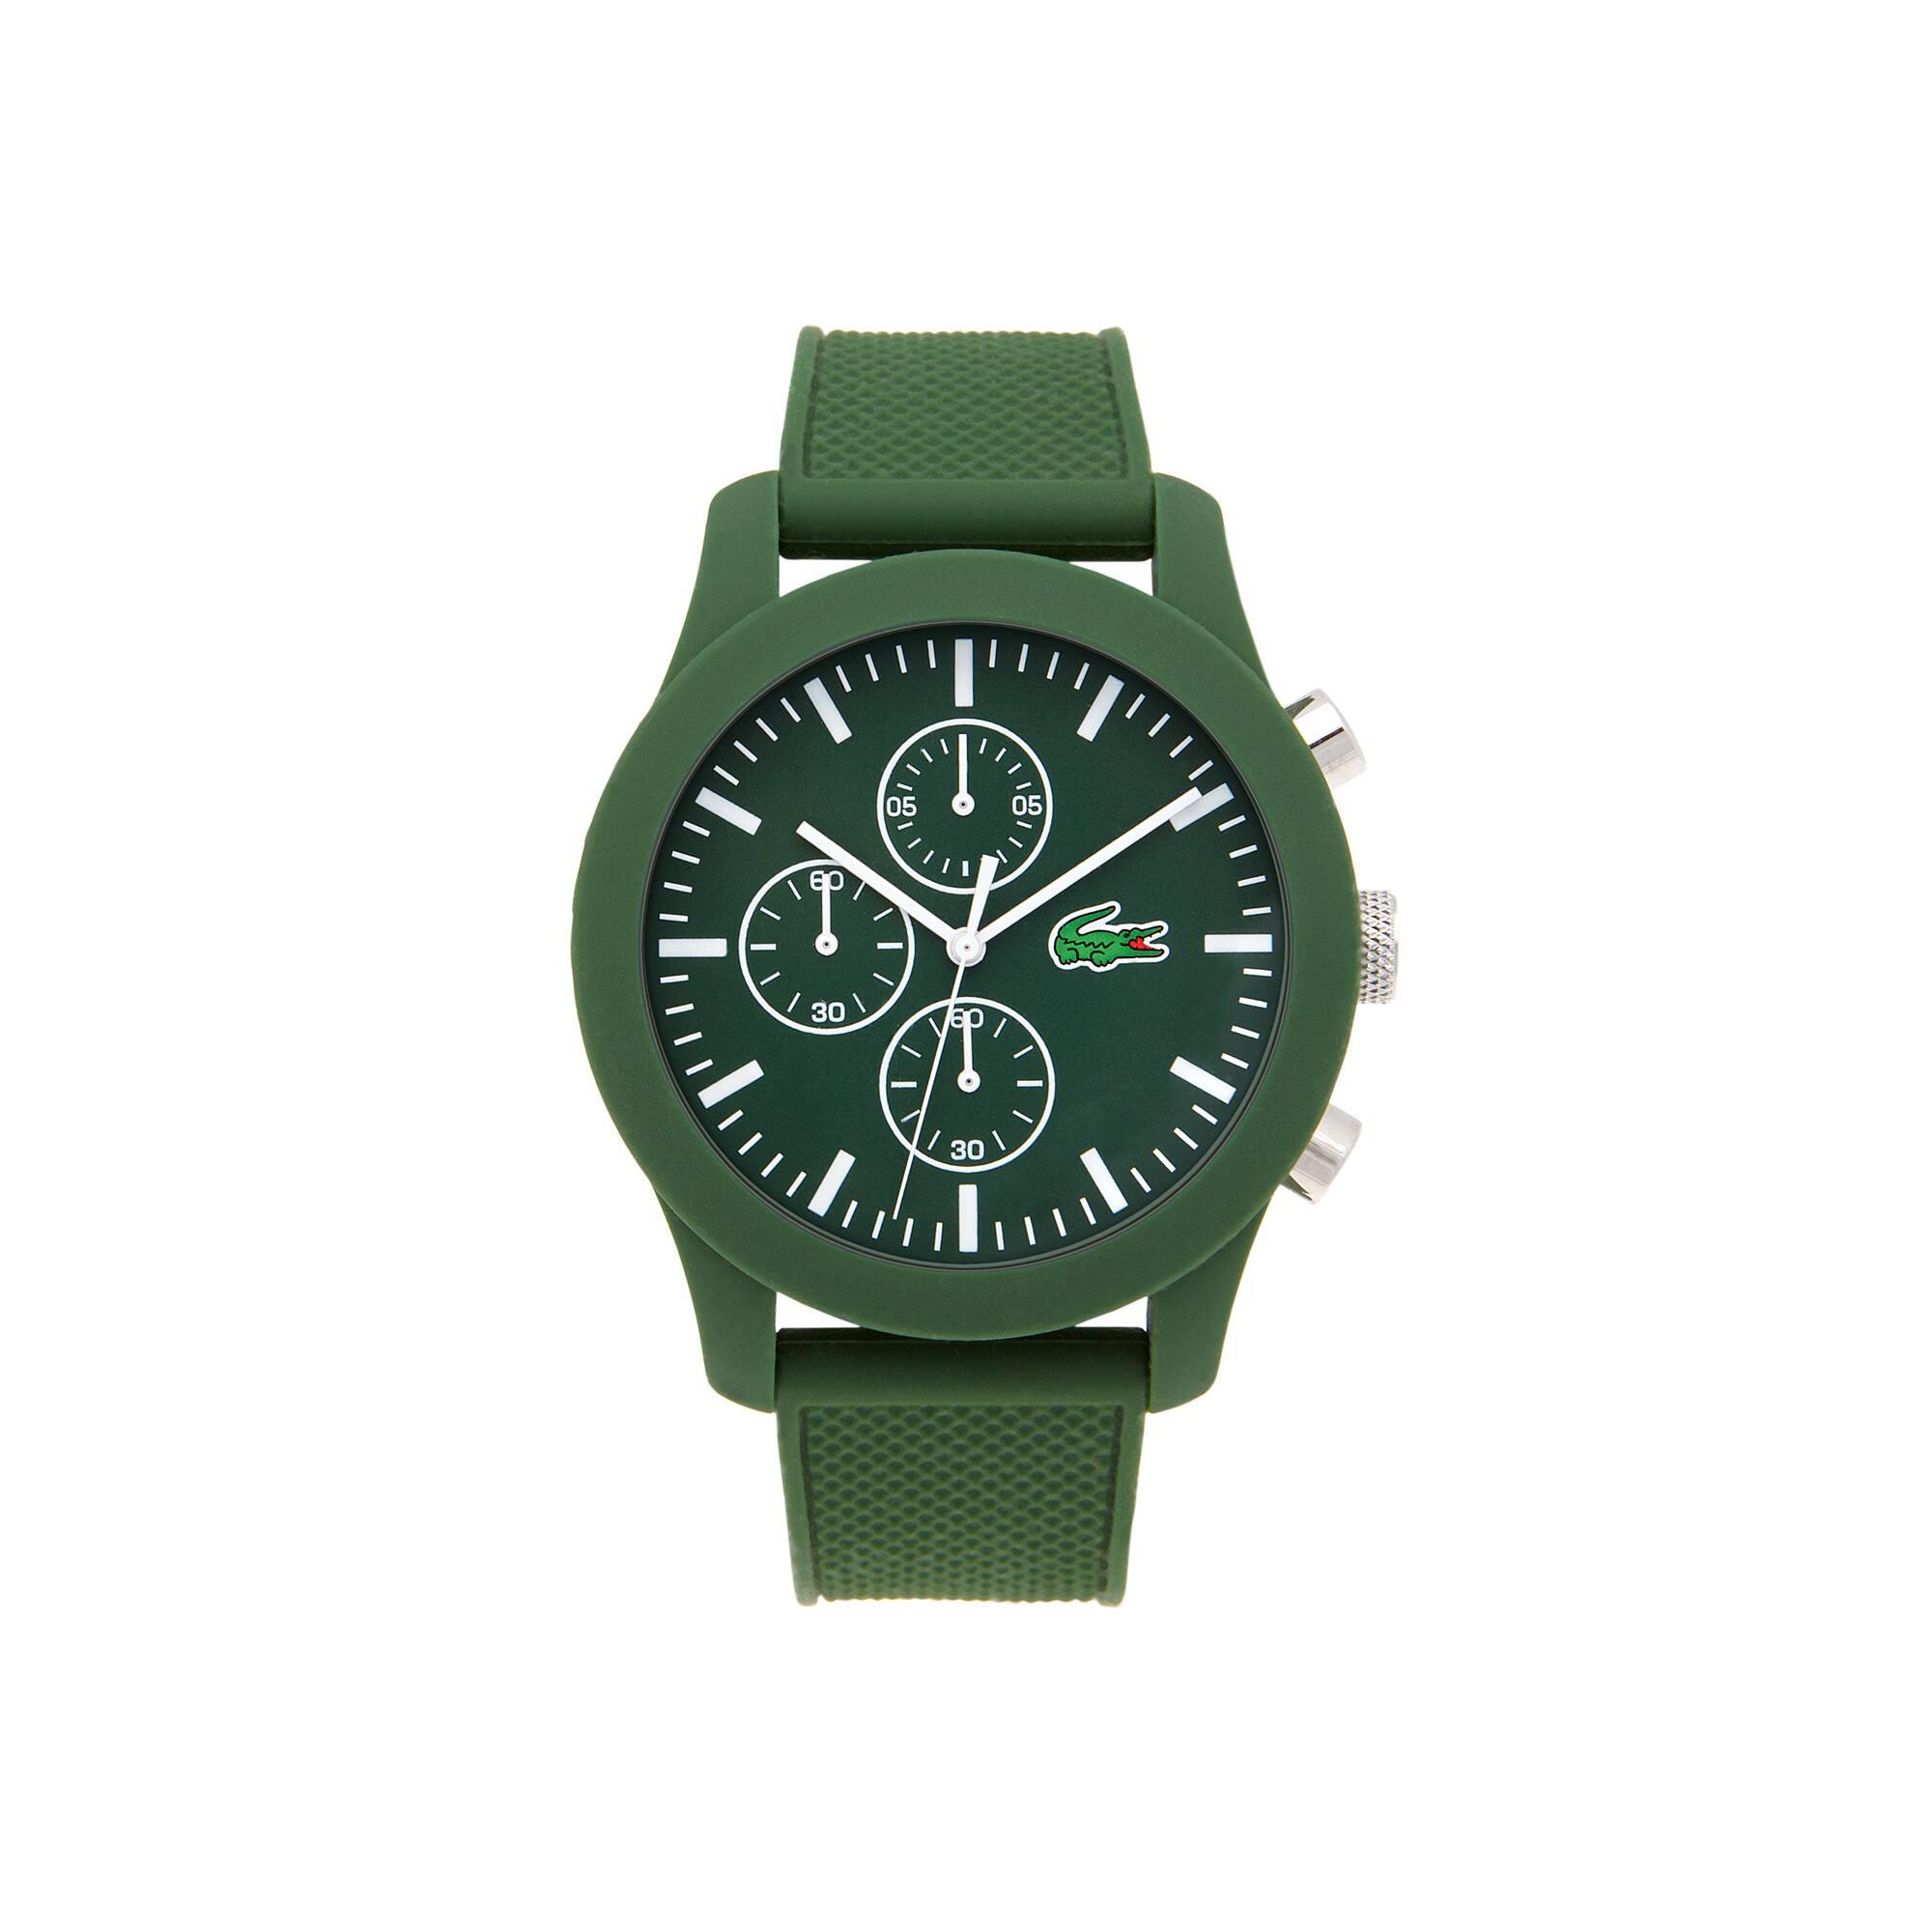 Lacoste.12.12 chronograafHorloge van groene siliconen